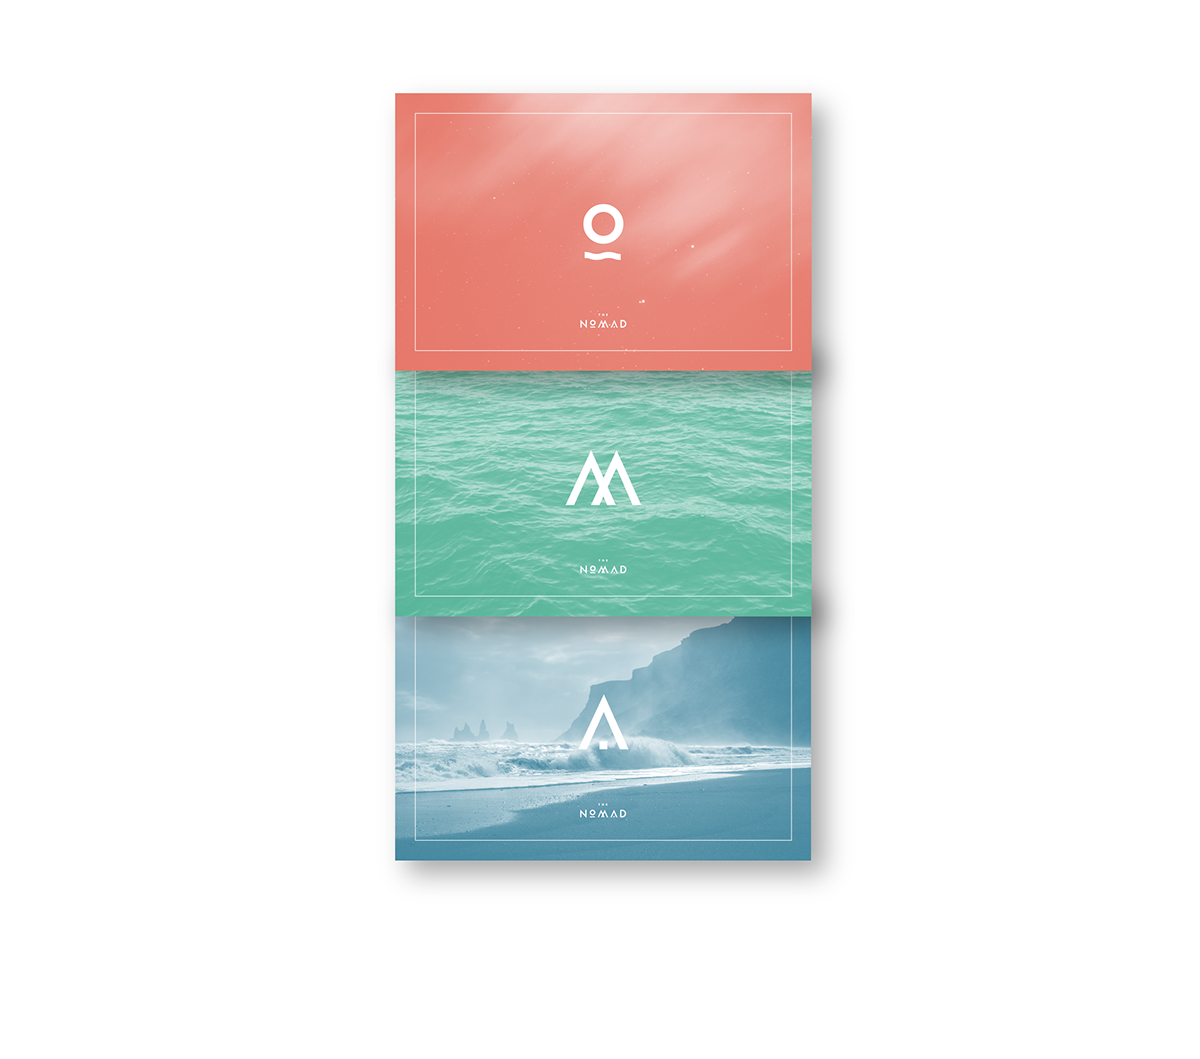 Ocean Nature nomad nomadic lifestyle high standard modern minimal Surf